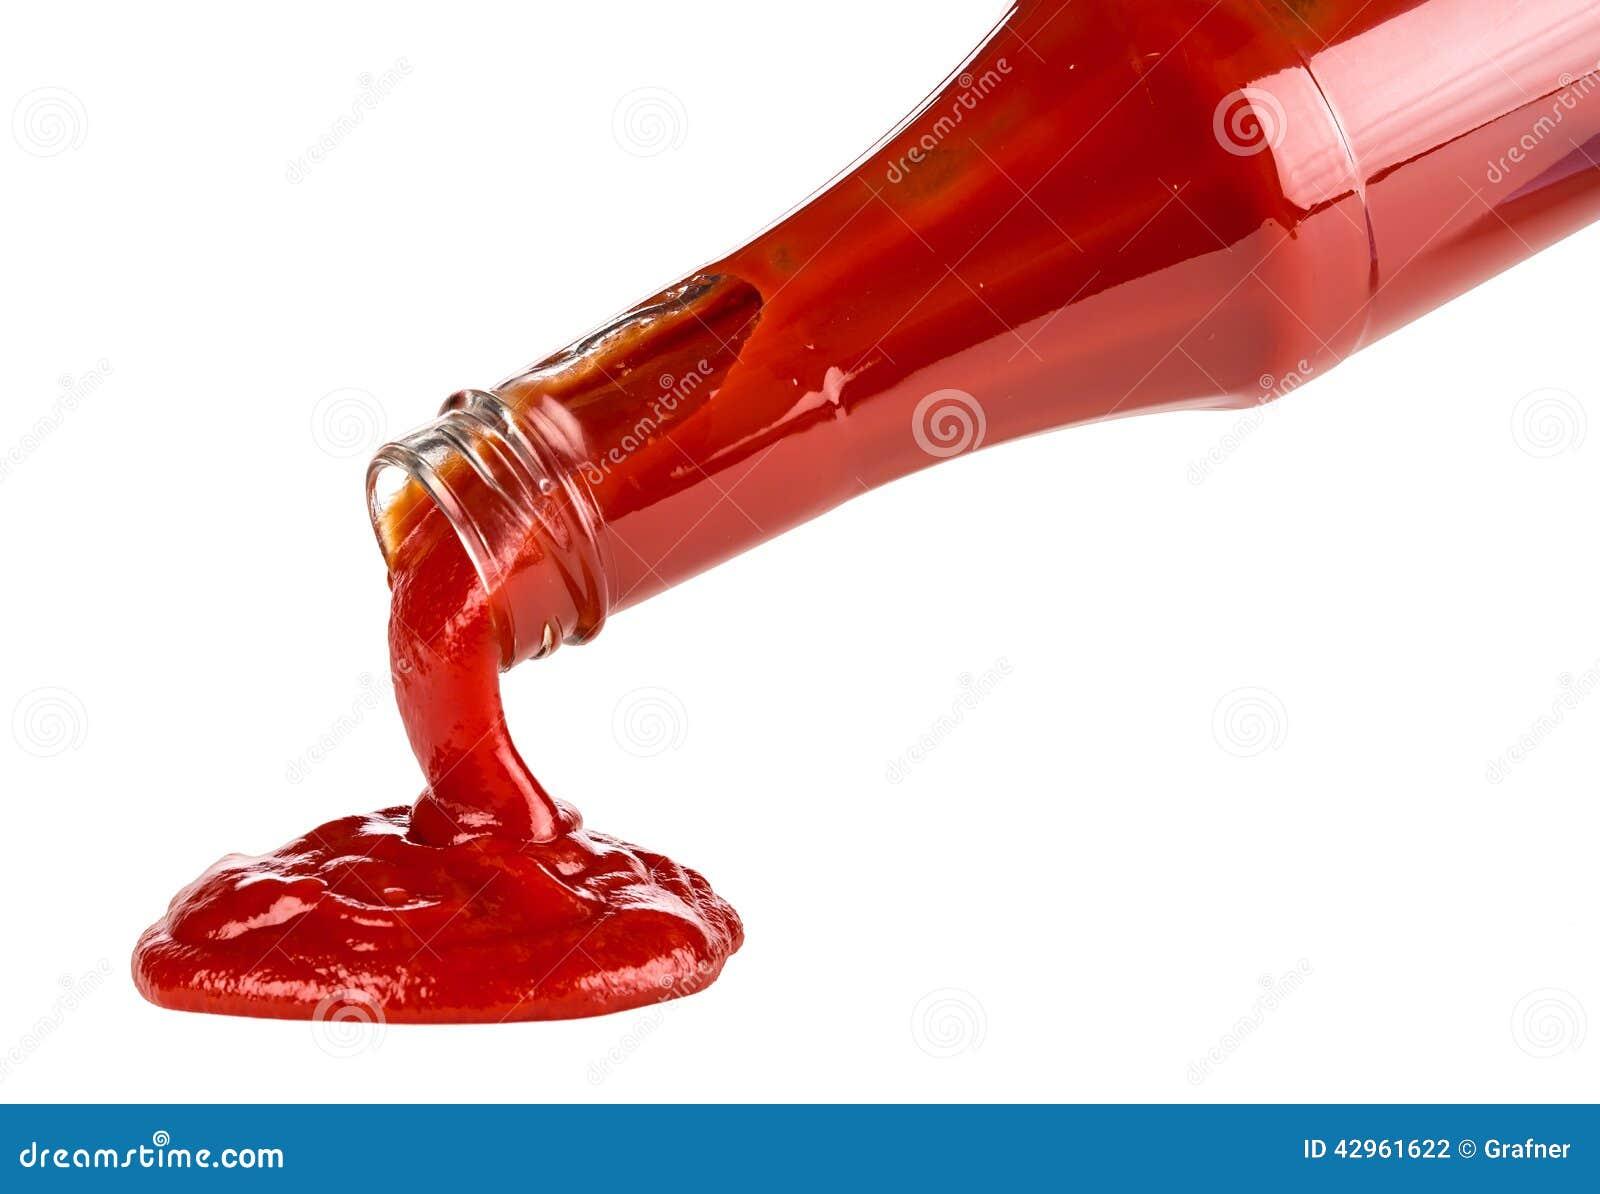 Tomato Ketchup Stock Photo - Image: 42961622